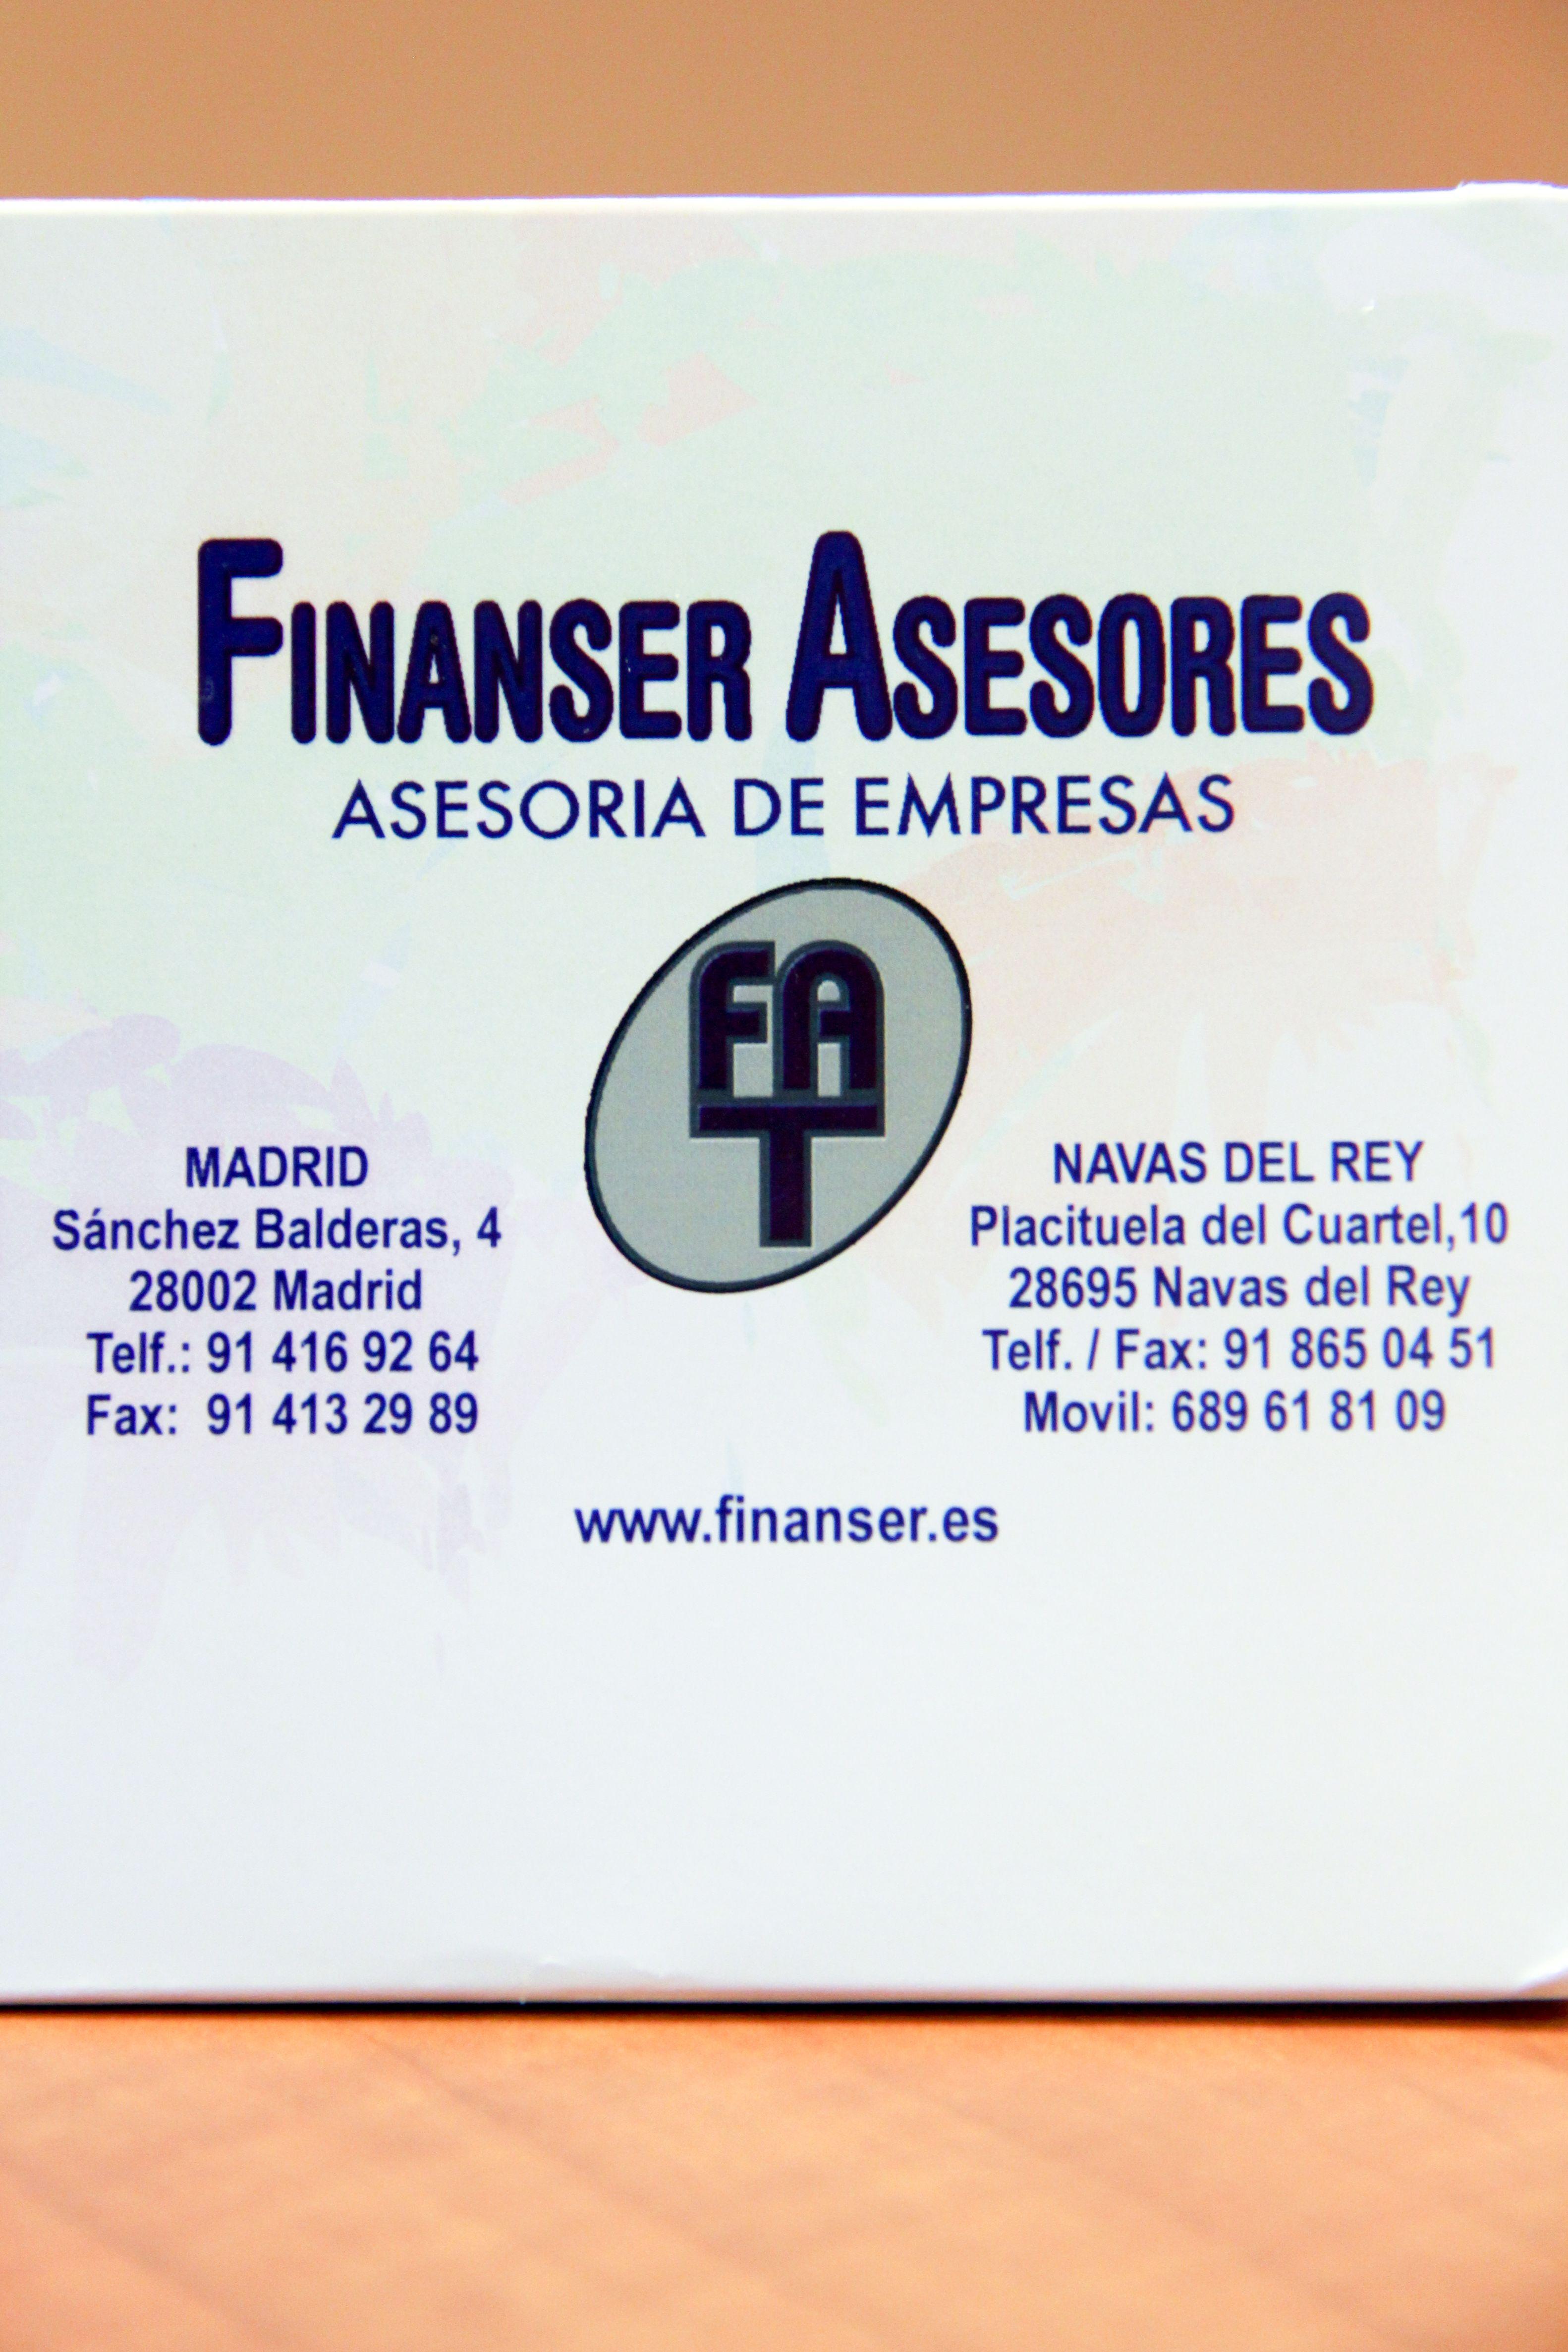 Rótulo informativo Finanser Asesores